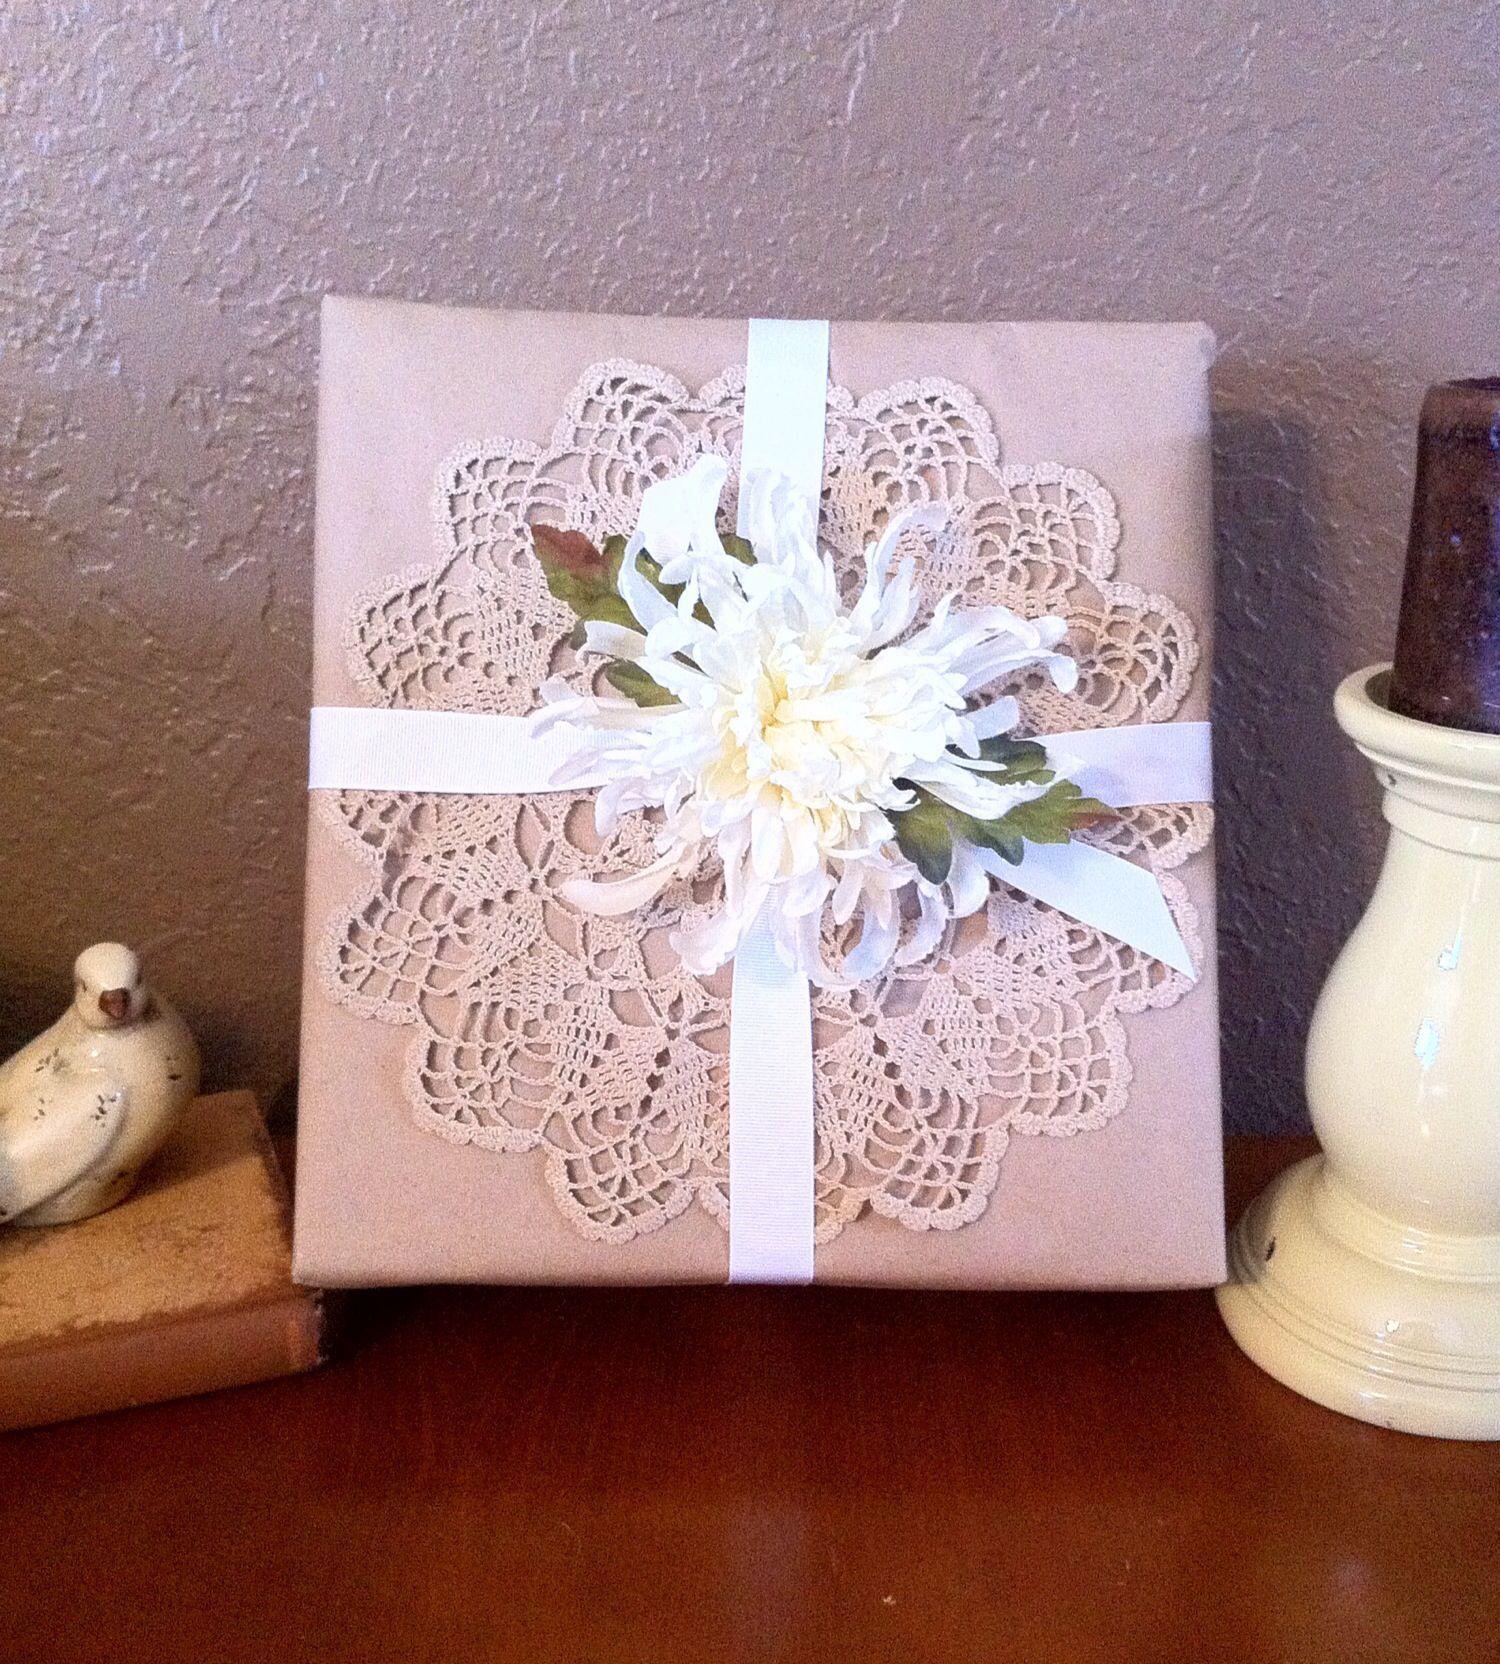 Bridal Shower Gift Wrap Wedding Shower Gift Wrapping Ideas Bridal Shower Gift Wrapping Ideas Bridal Shower Gifts